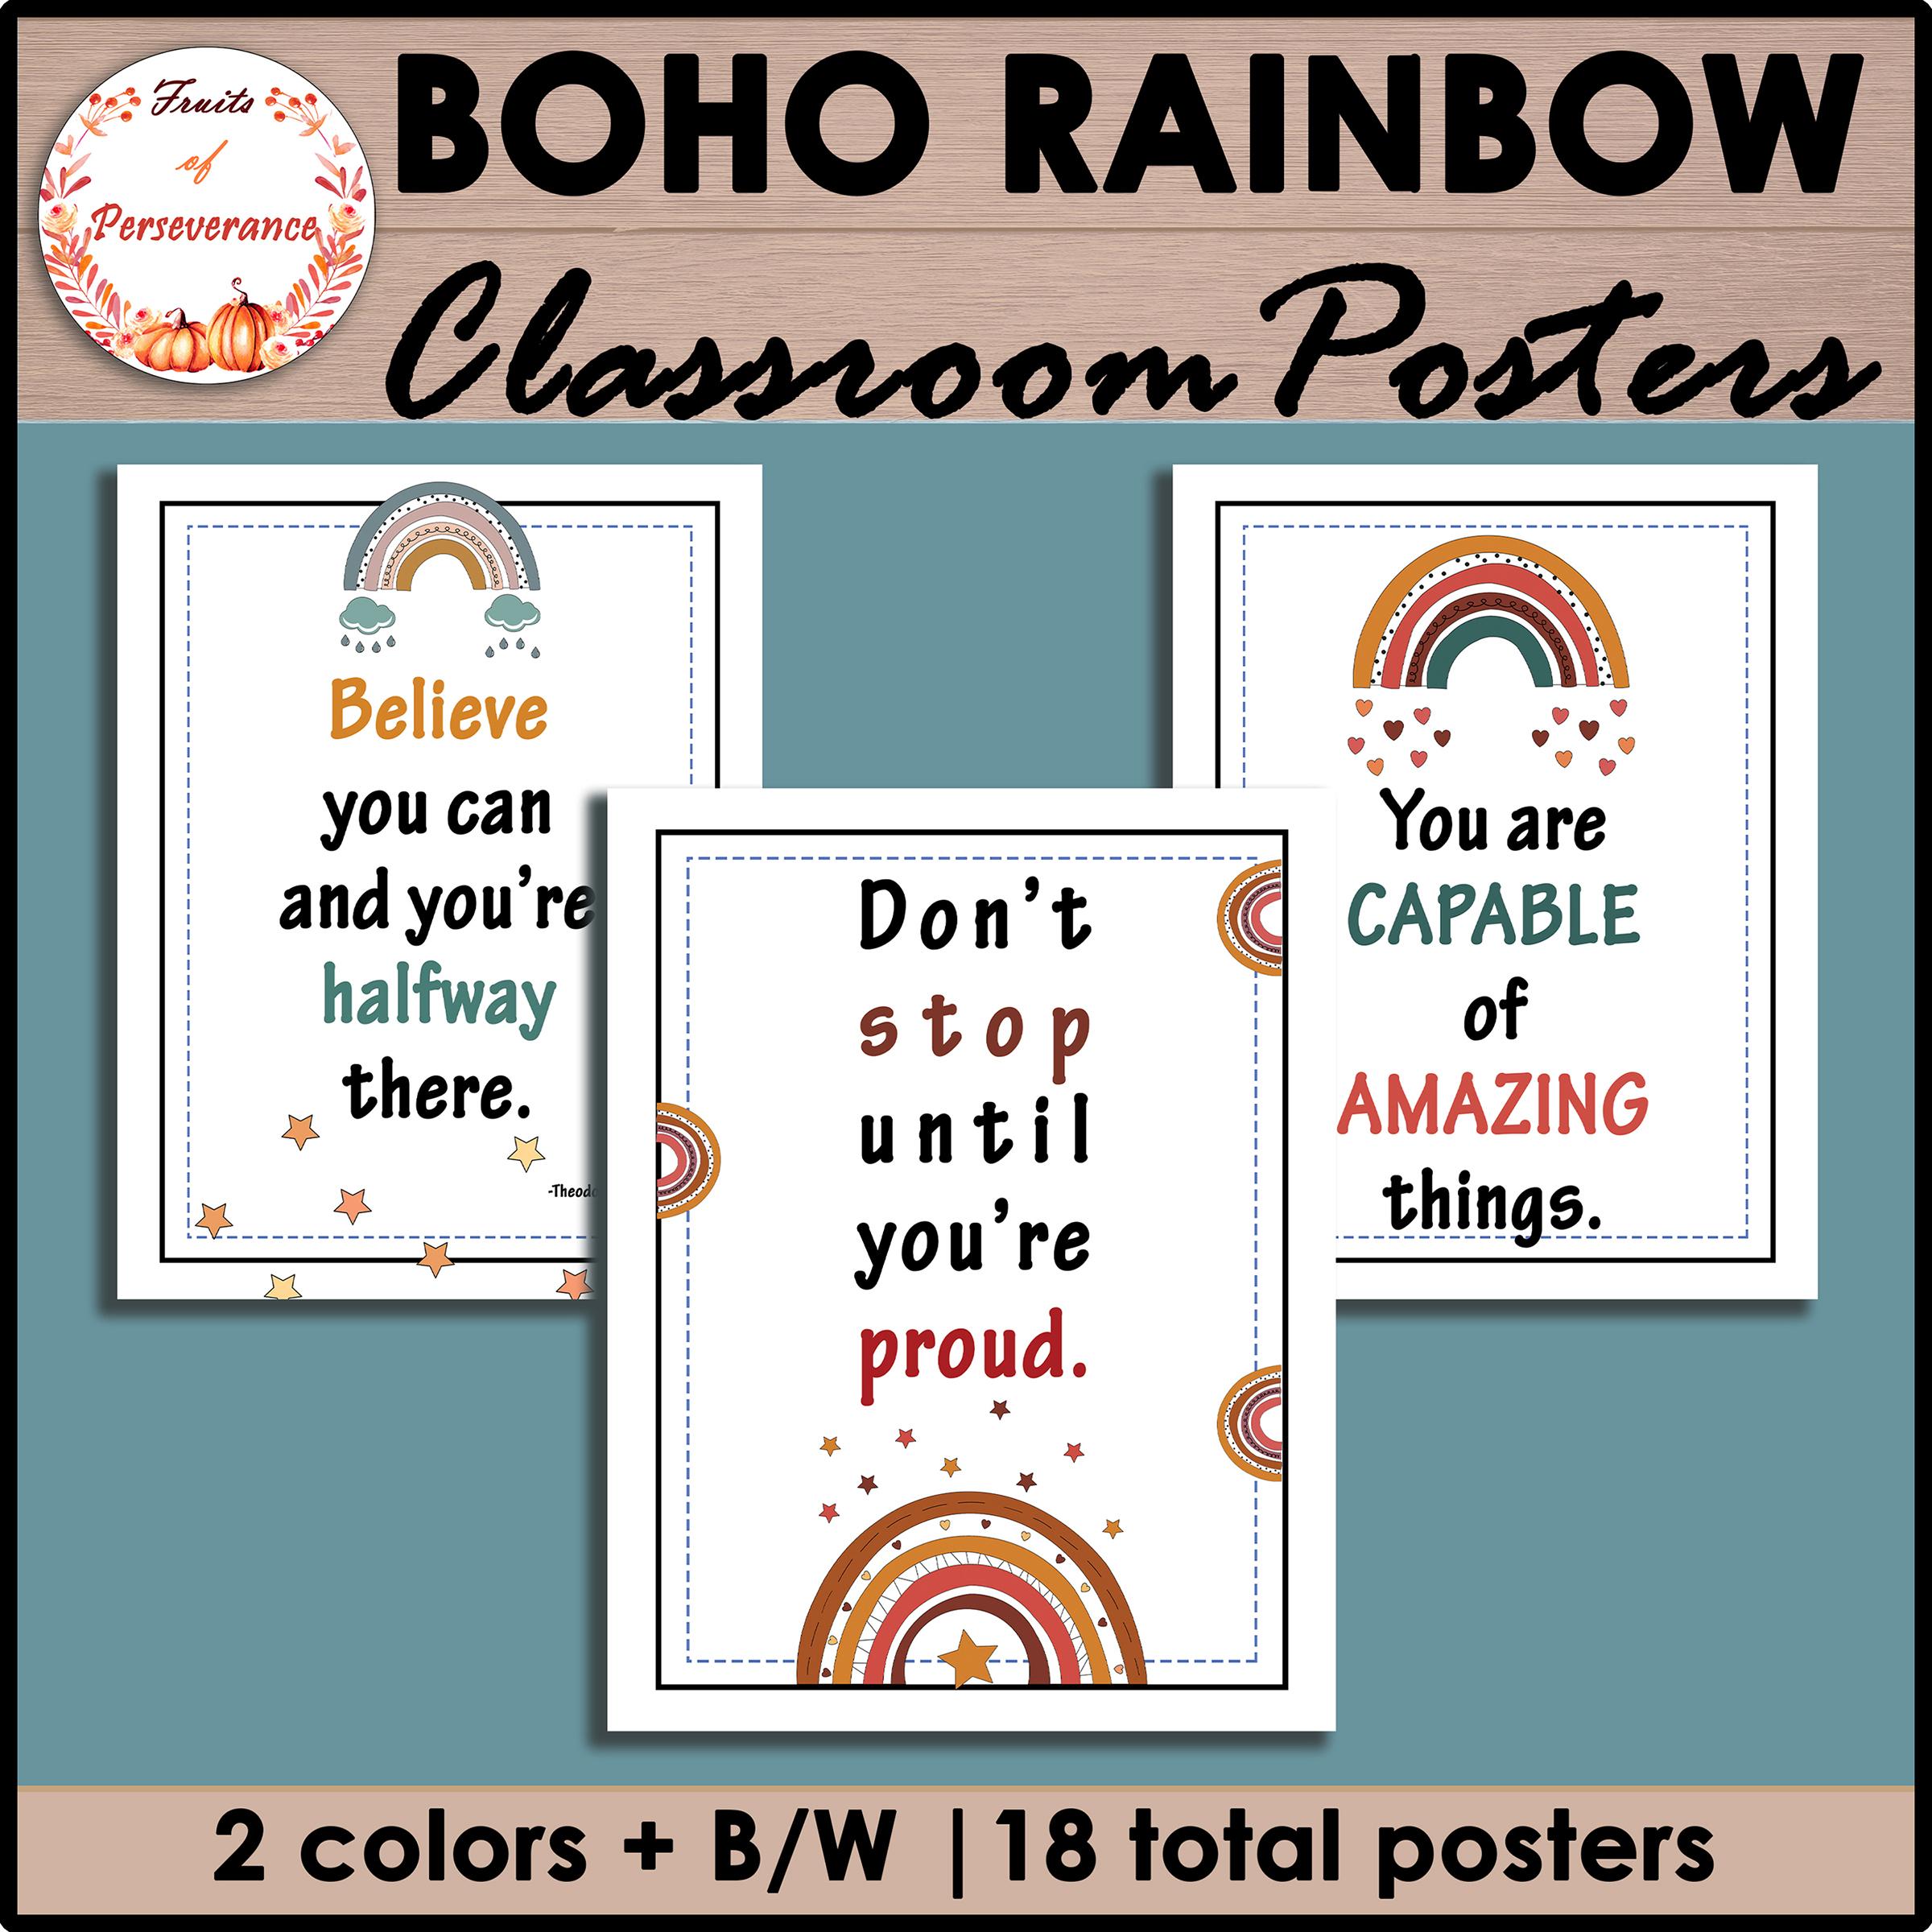 Boho Rainbow Classroom Inspirational Posters